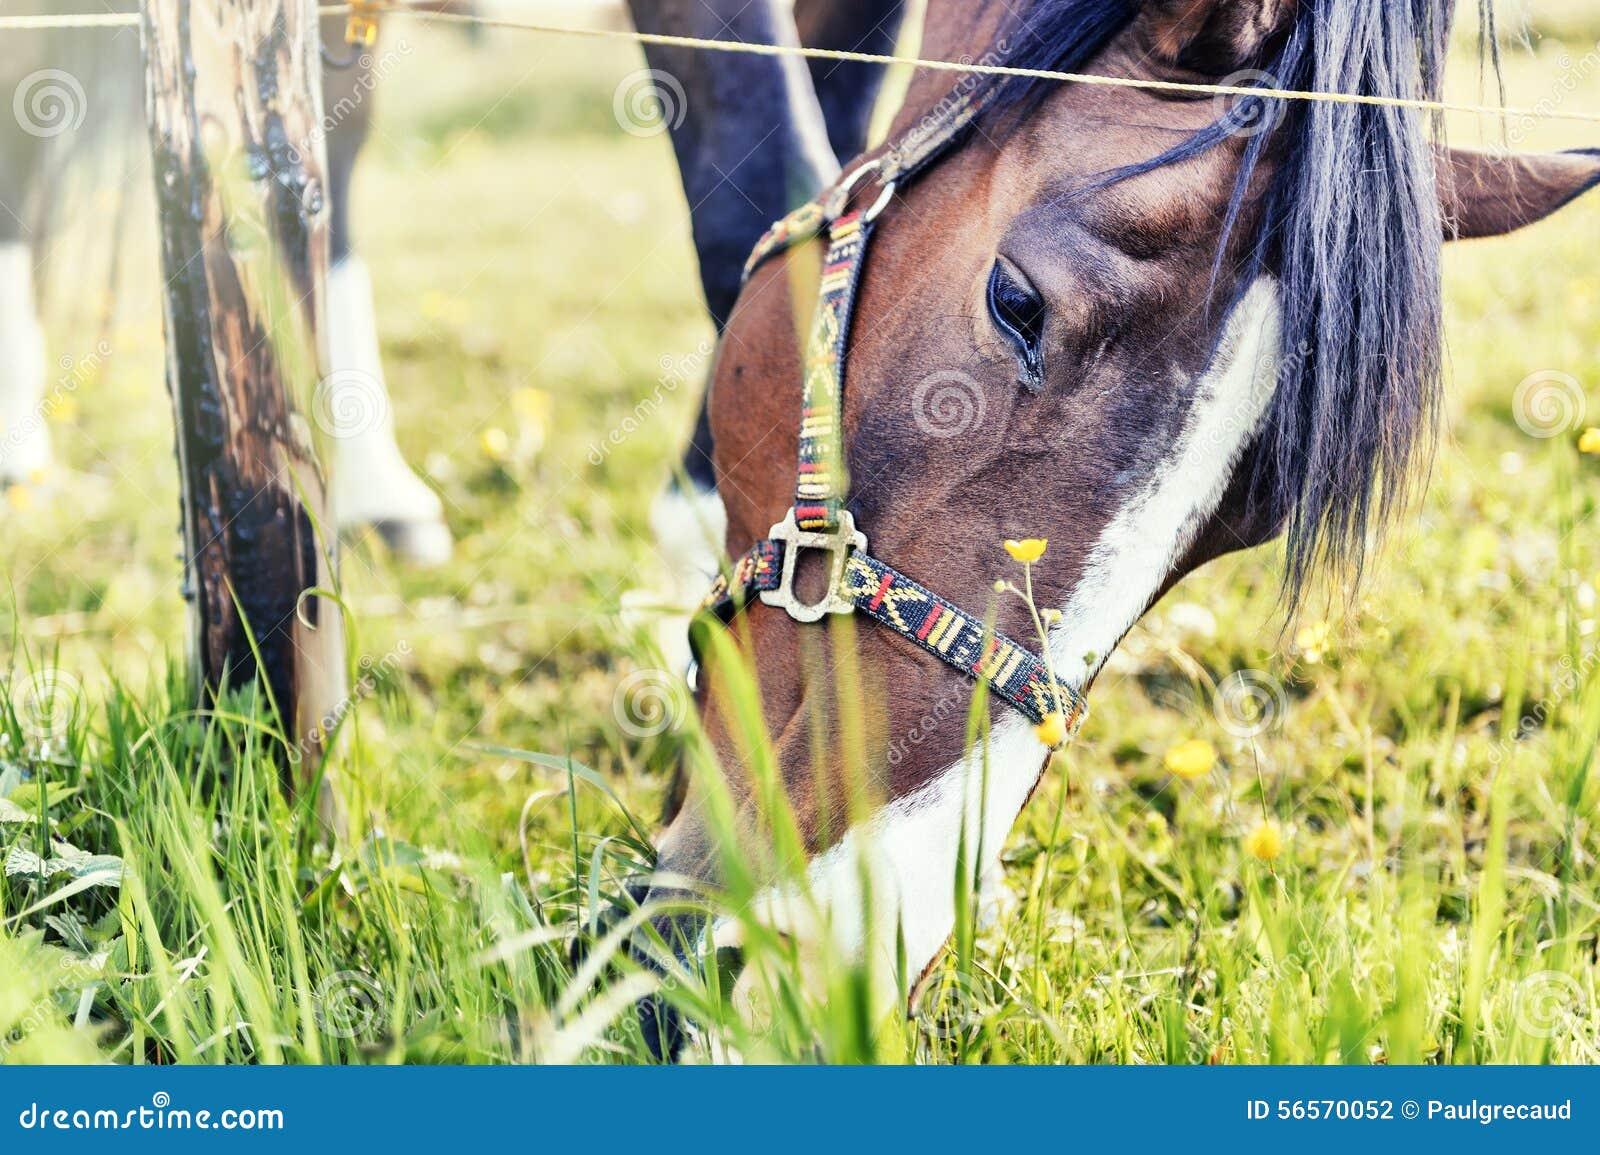 Download Κινηματογράφηση σε πρώτο πλάνο του αλόγου που τρώει τη χλόη Στοκ Εικόνες - εικόνα από επαρχία, γεφυρώματος: 56570052